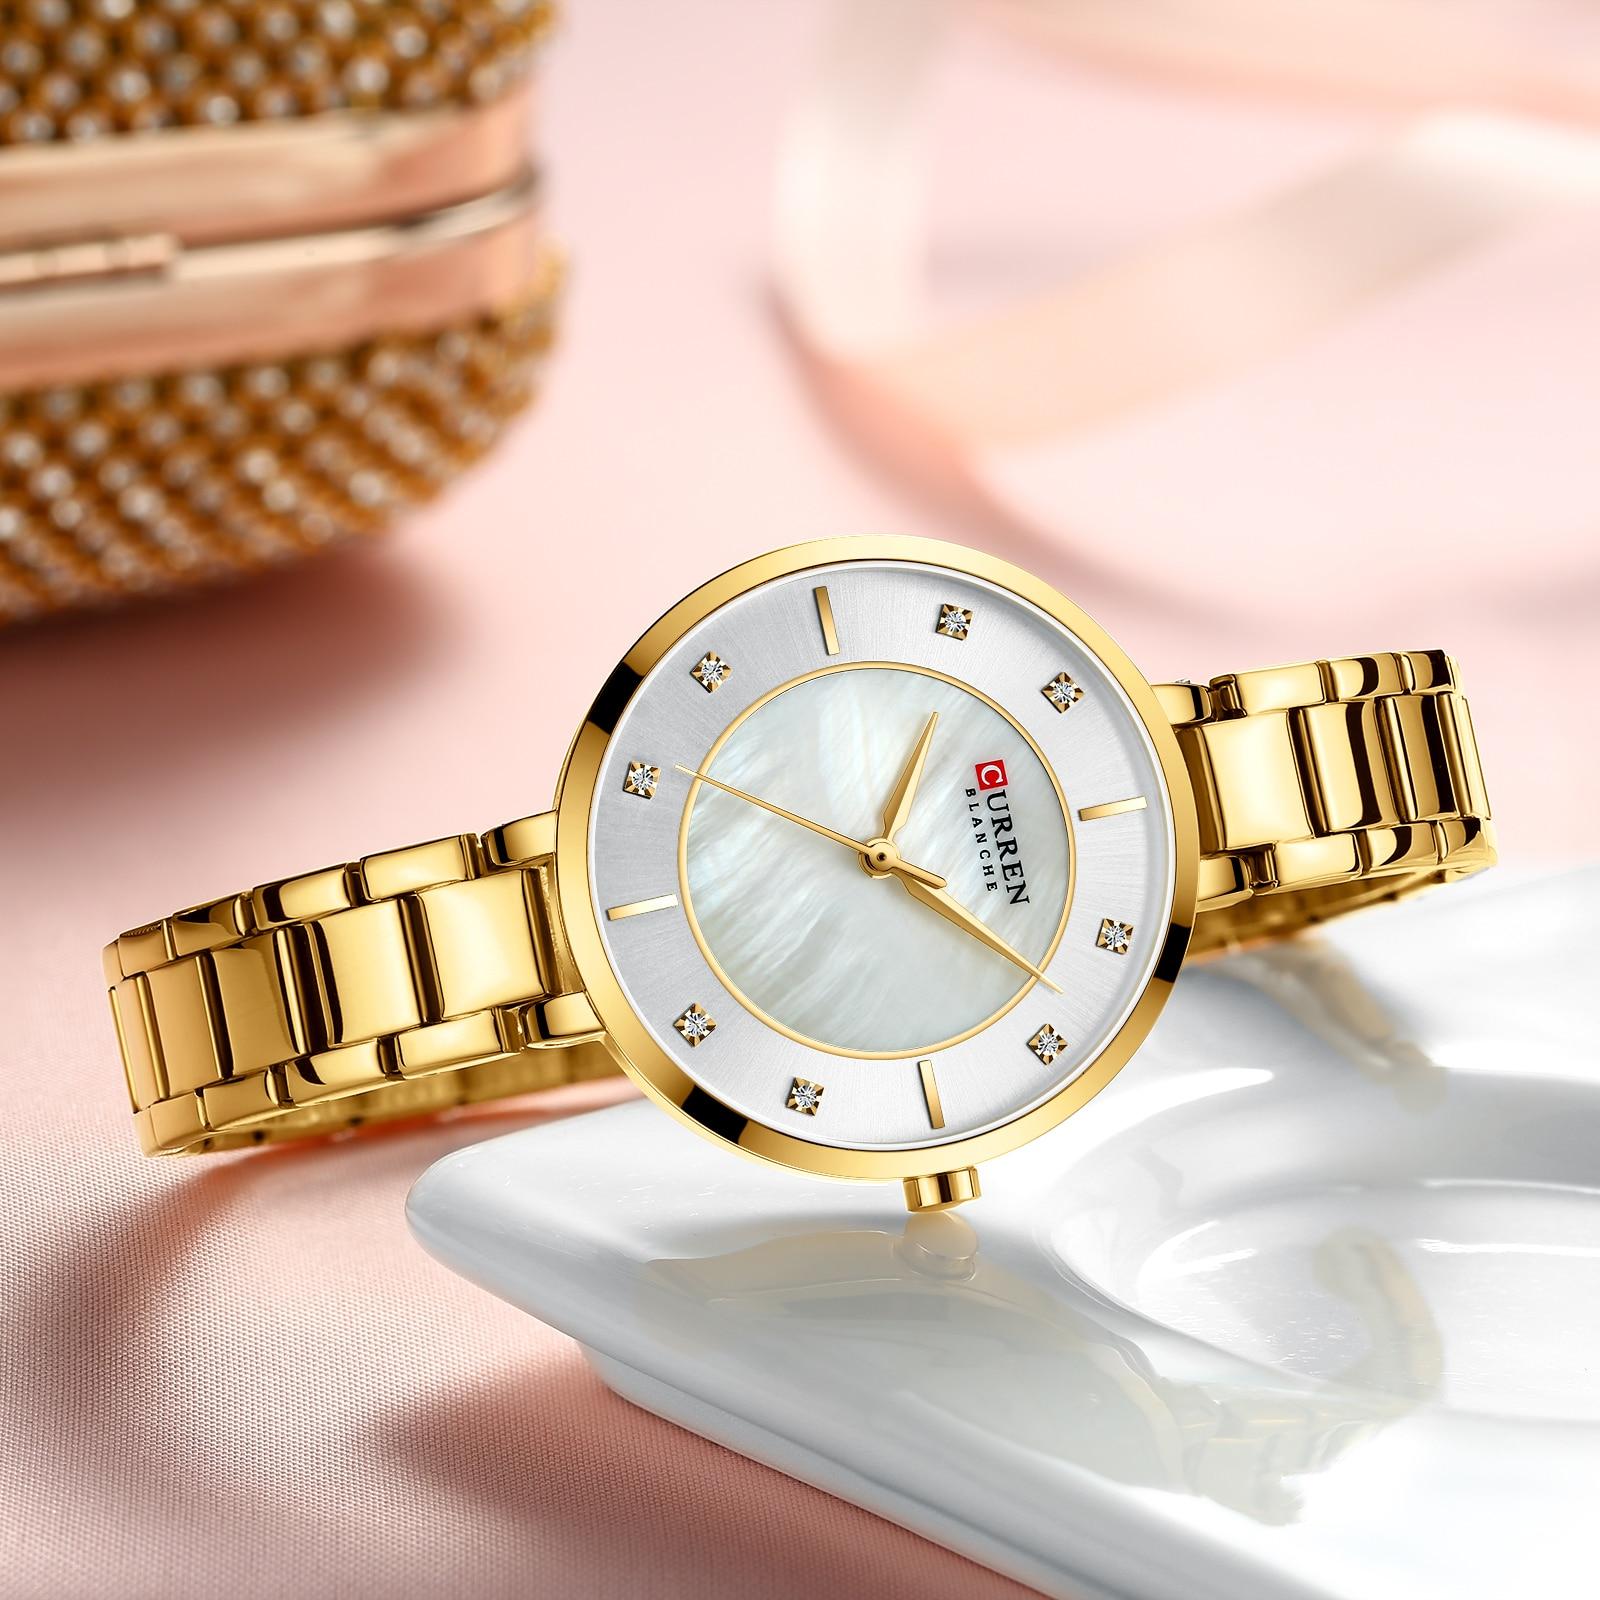 CURREN 2019 Womens Watches Golden Rhinestone Analog Round Quartz Watch Dress Bracelet Chain Waterproof Lady Wristwatch Dropship enlarge